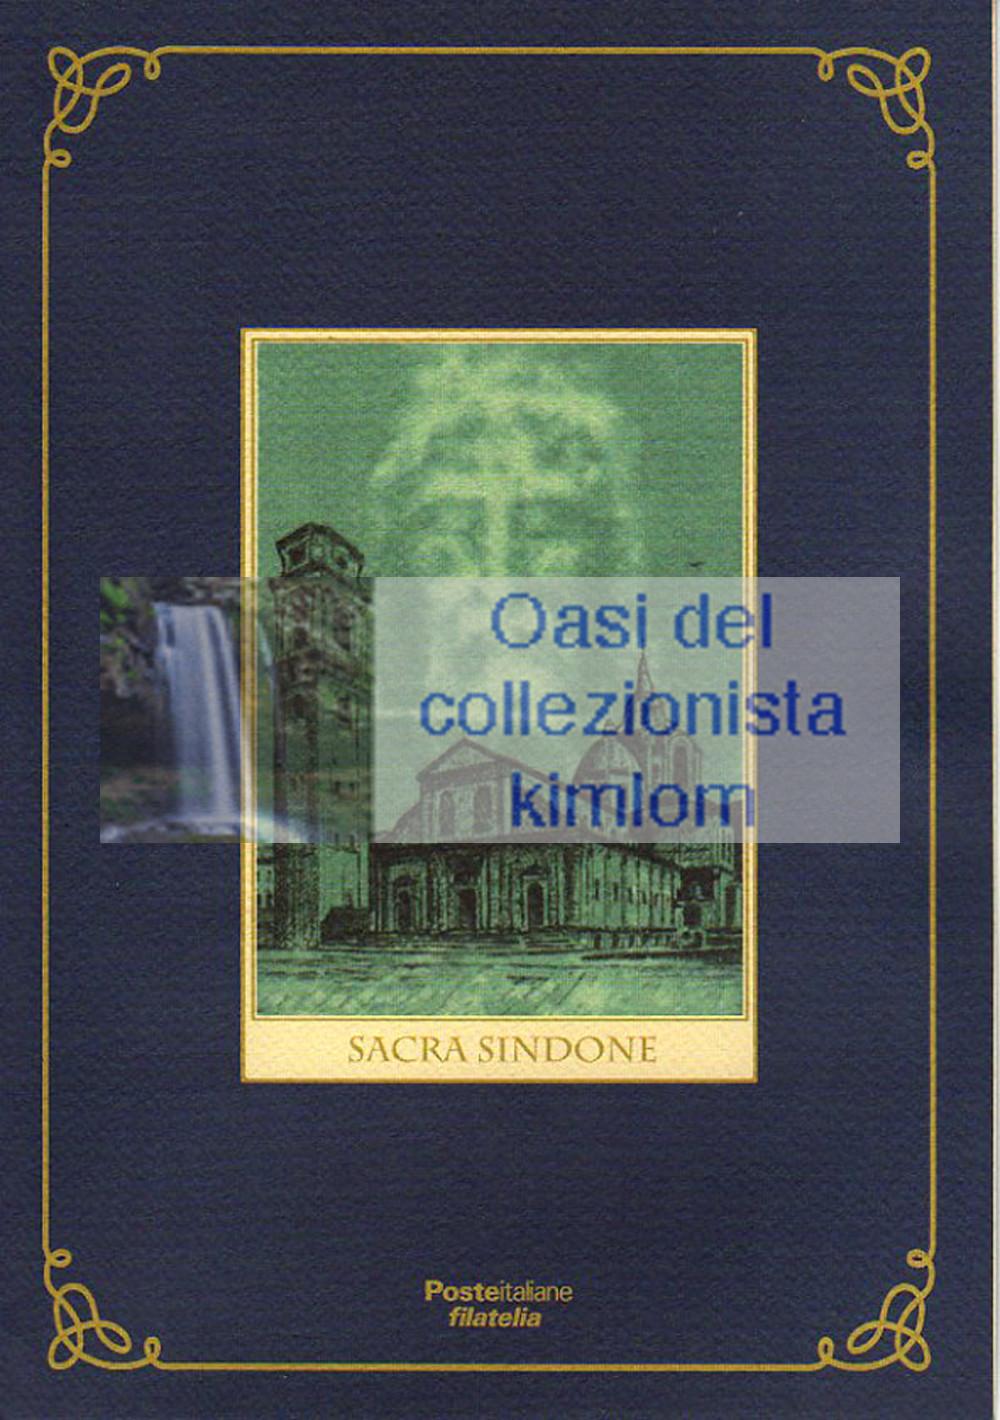 folder - Sacra Sindone